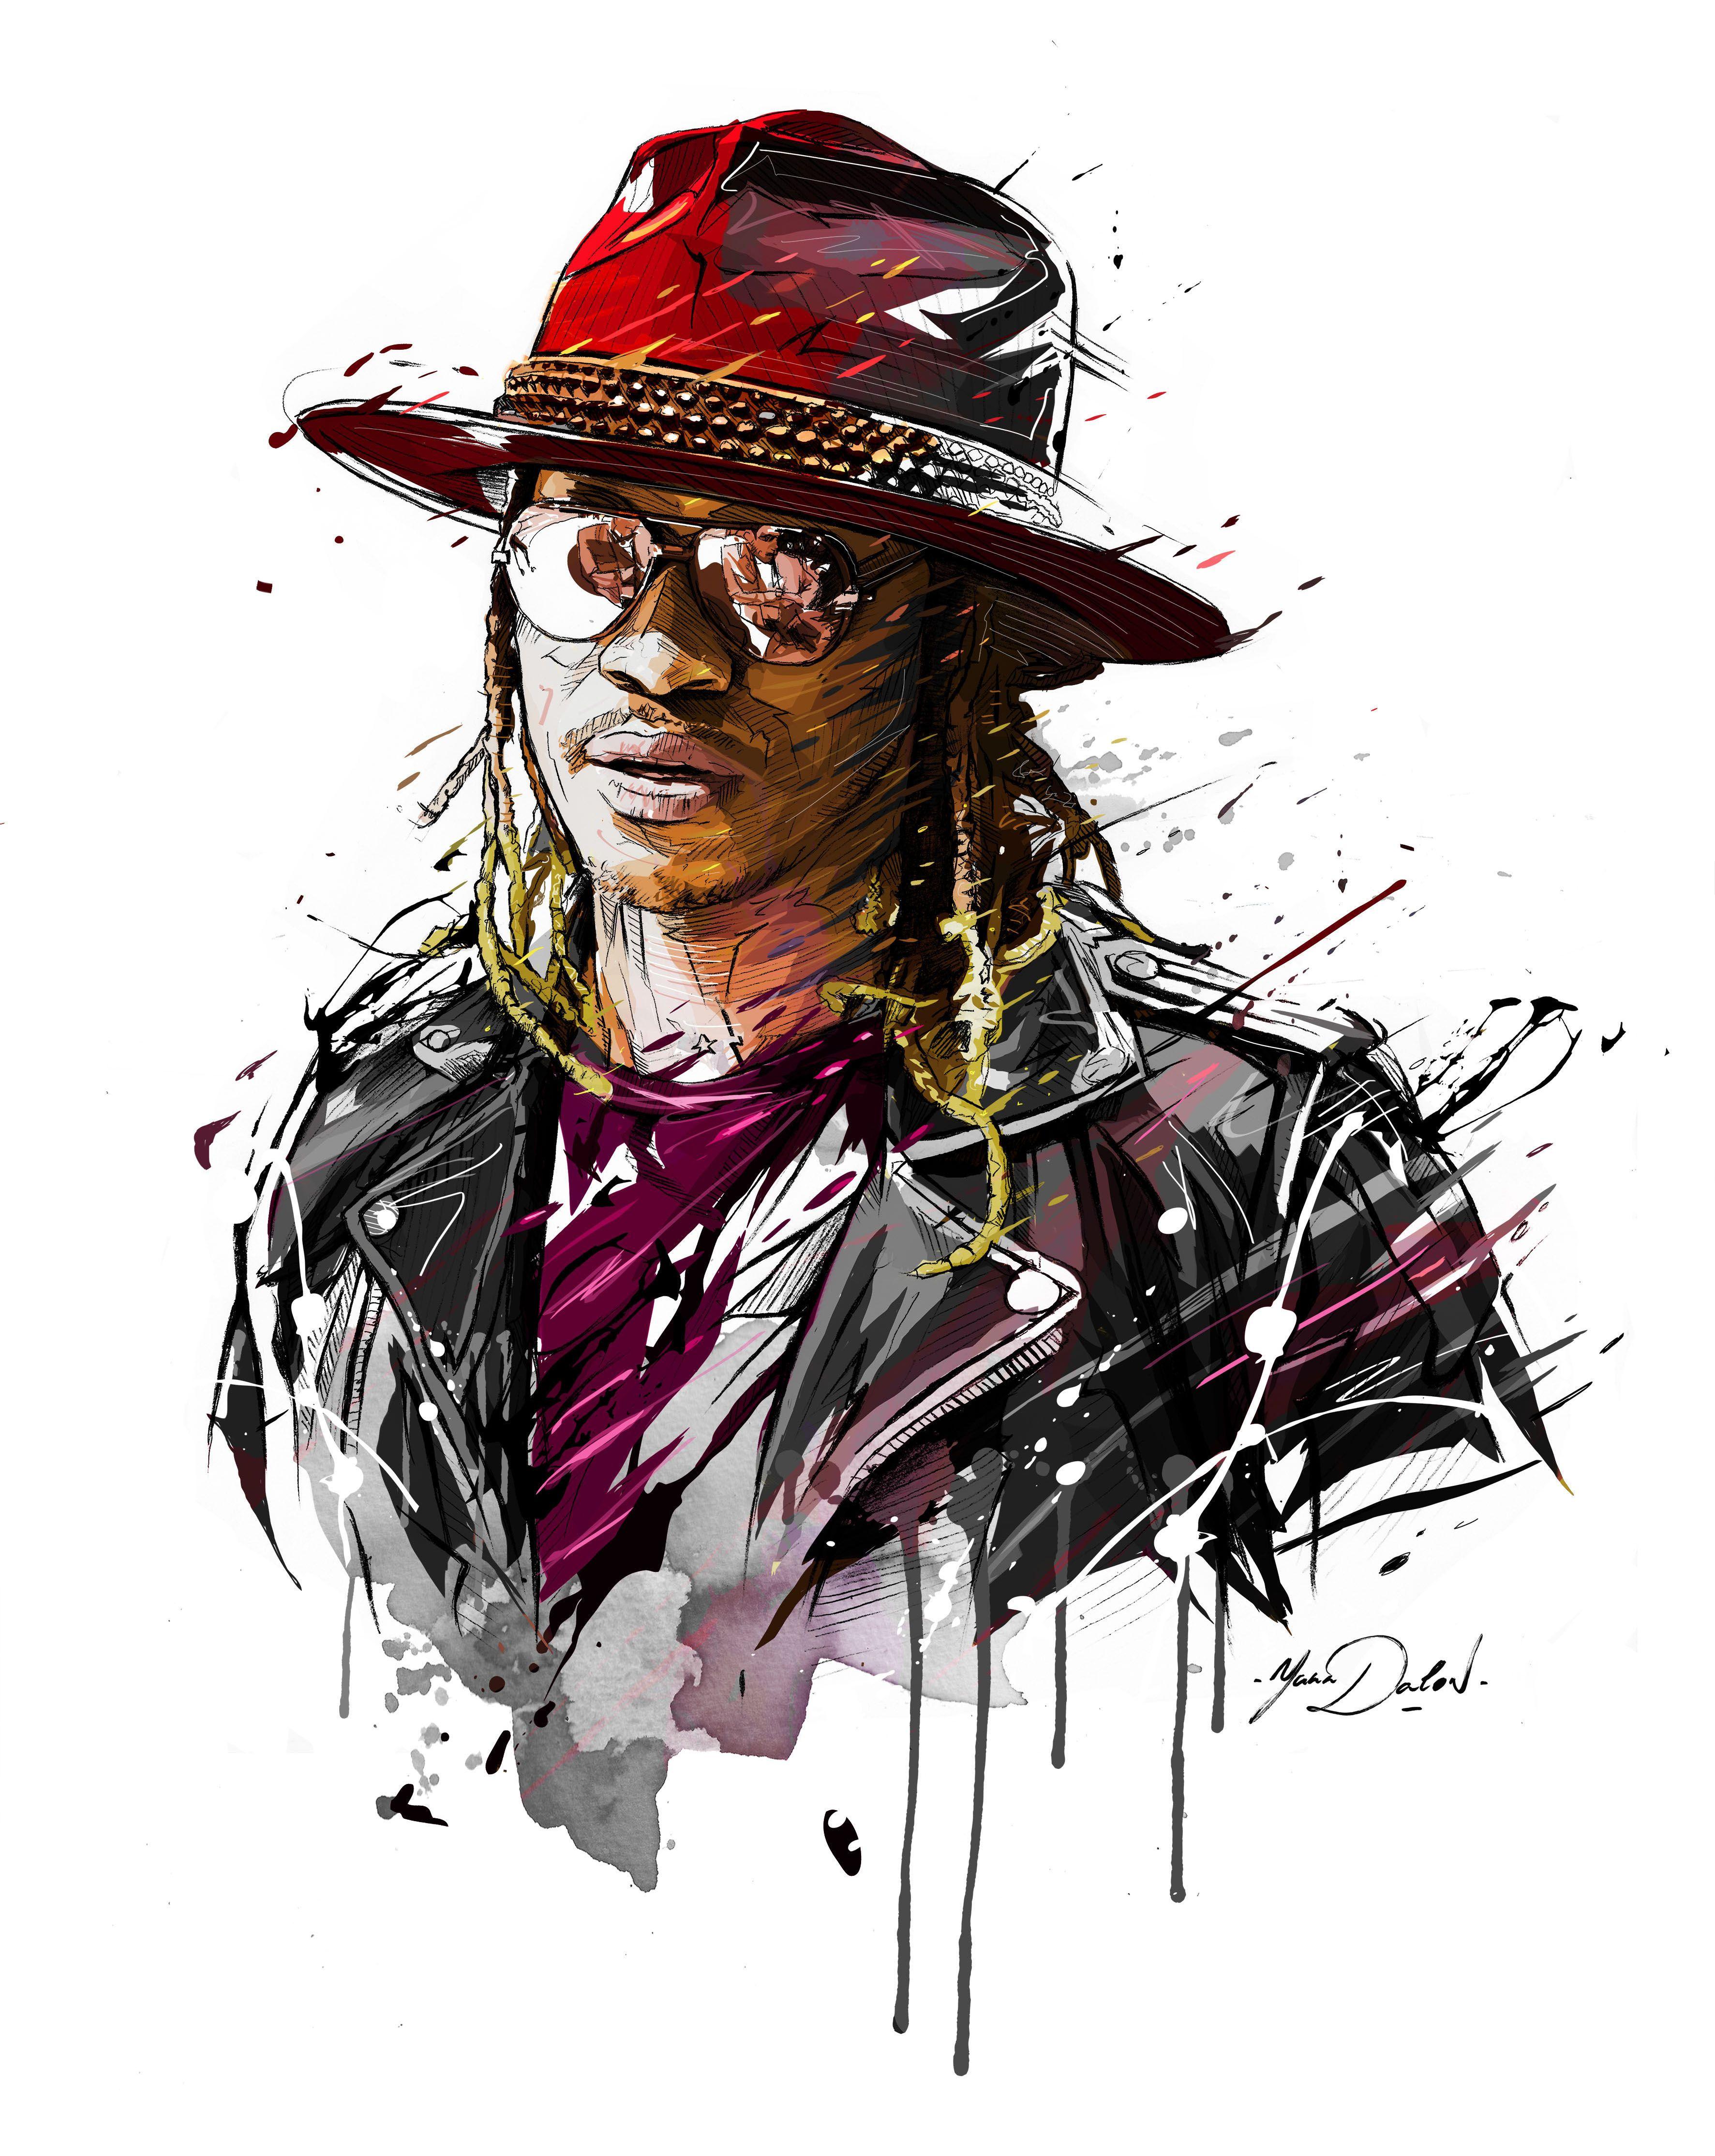 My Illustration Of Nayvadius DeMun Wilburn Aka FUTUREAmerican Rapper